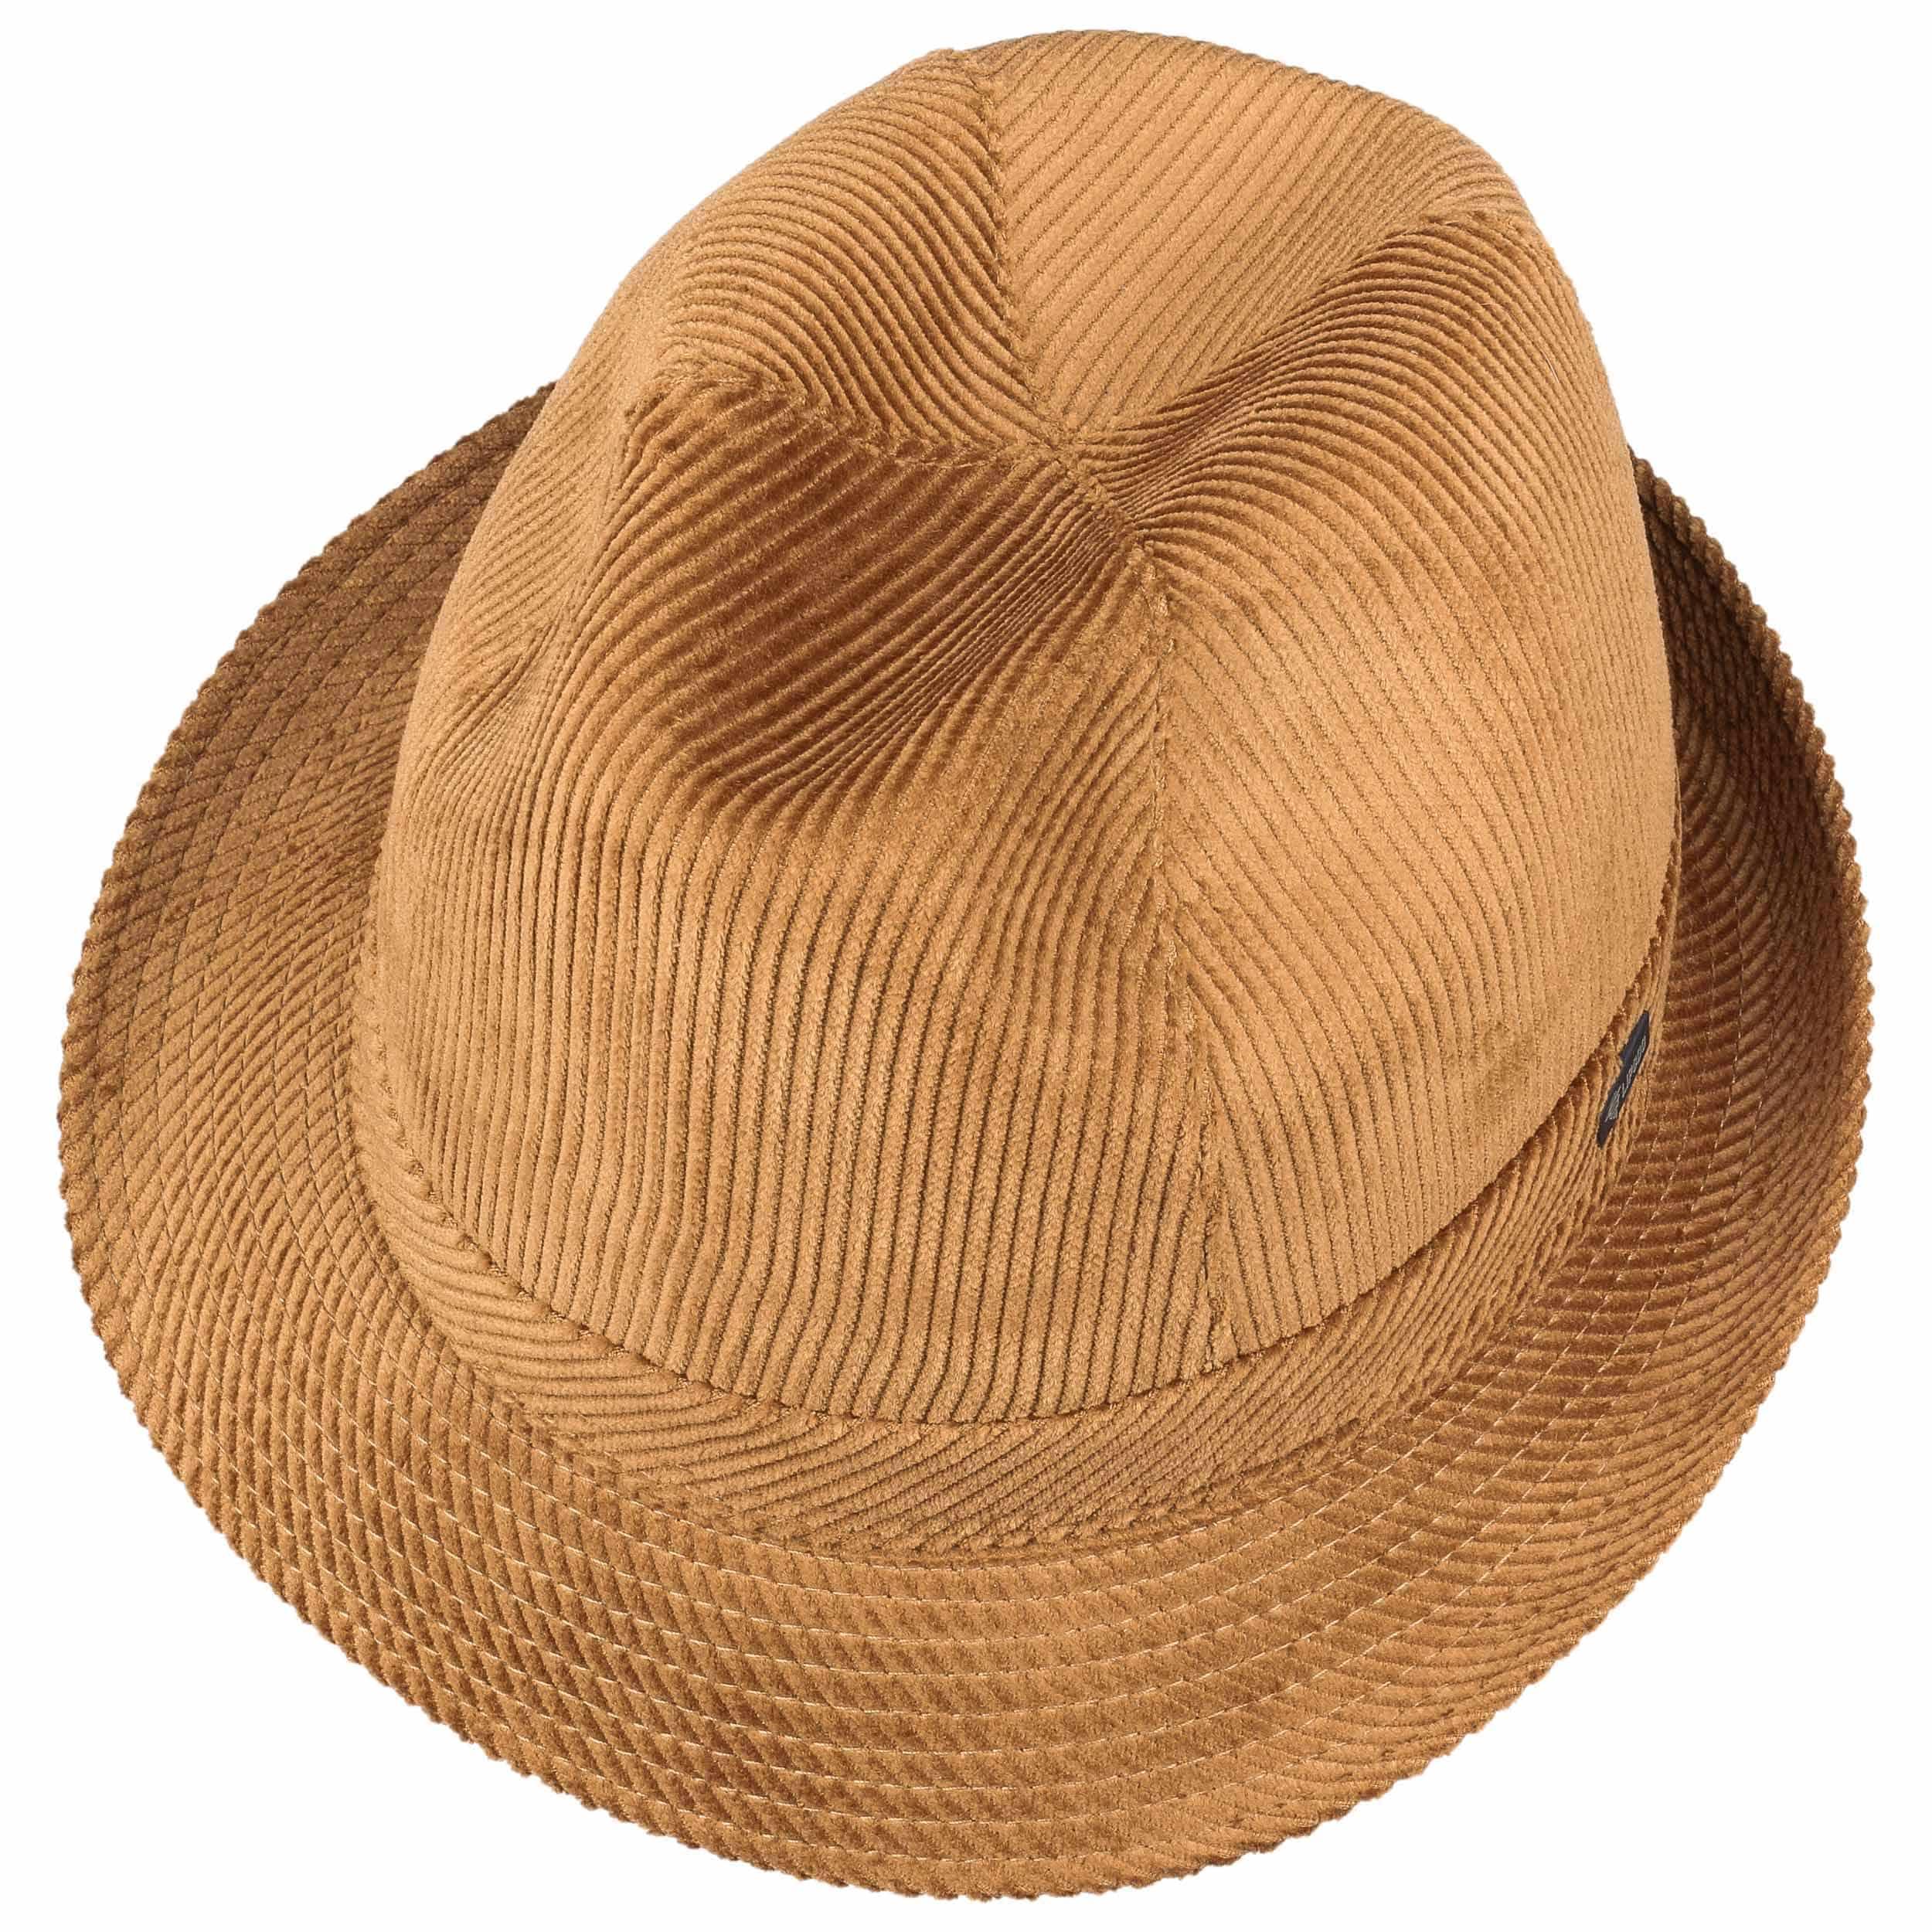 465fbb8ea8f ... Molinar Corduroy Hat by Lipodo - brown 2 ...